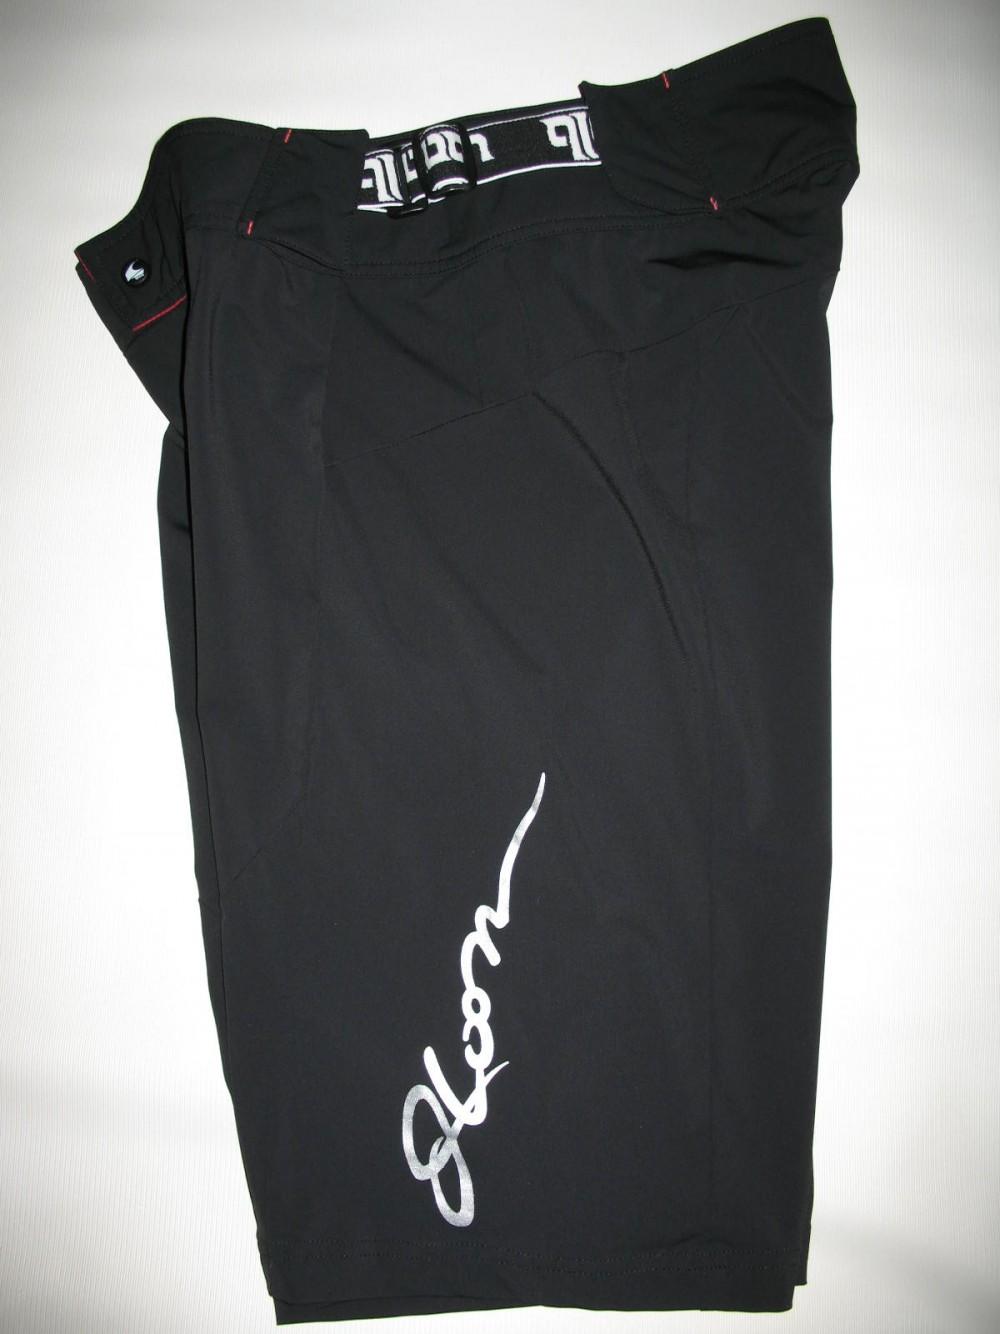 Велошорты QLOOM surf MTB cycling shorts (размер 34/L) - 2